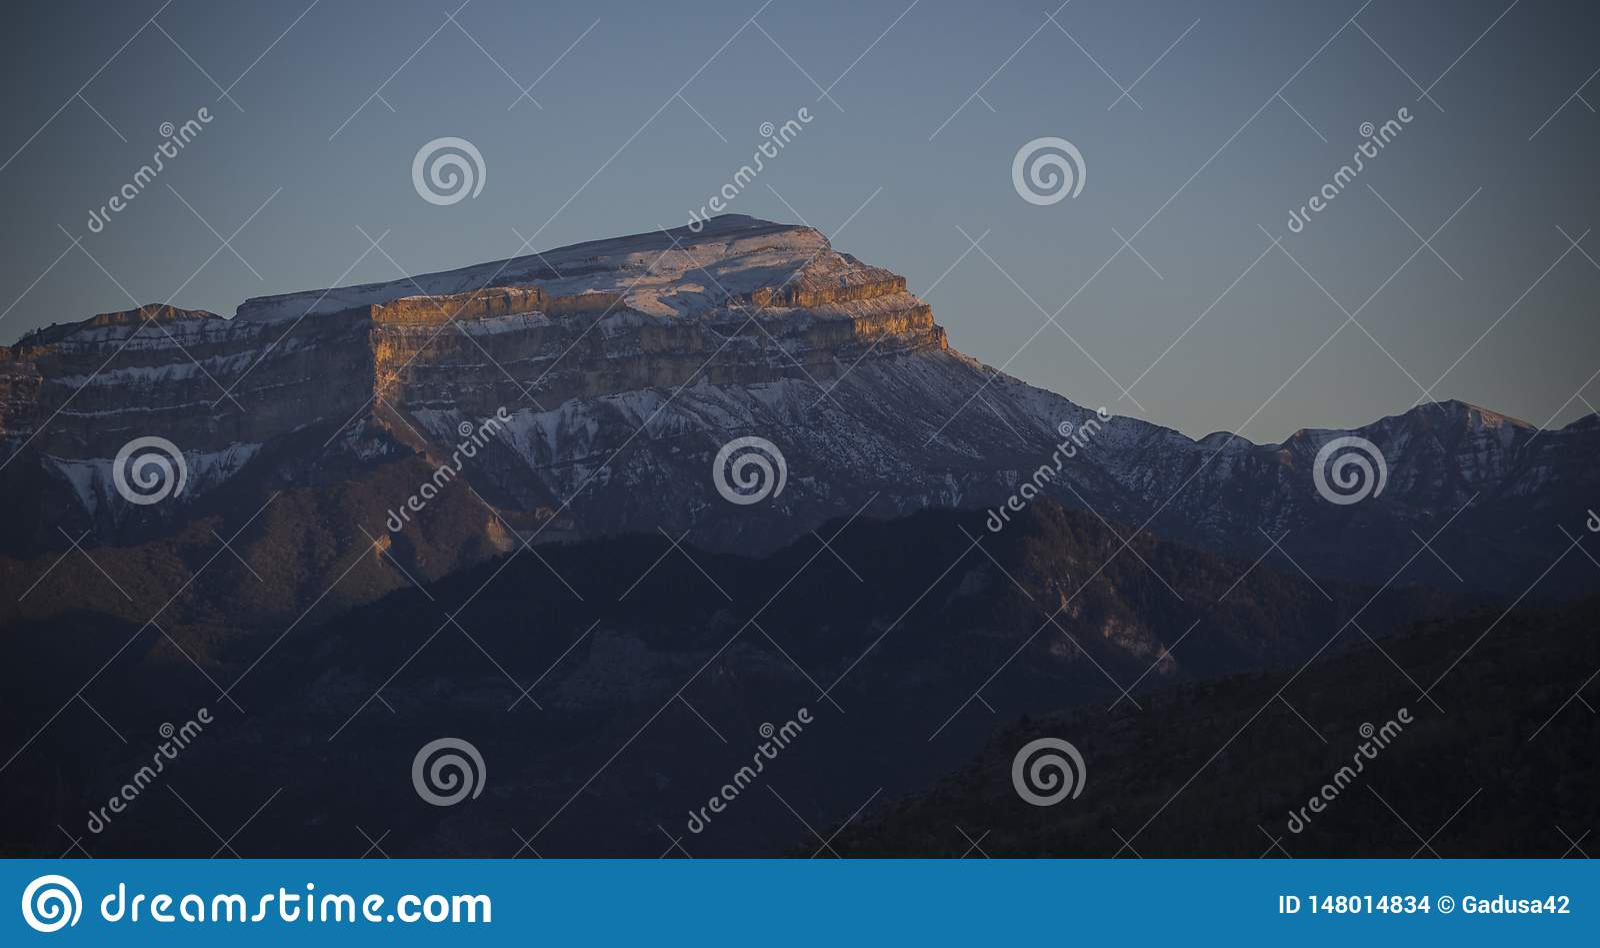 Snowy caucasus mountain at sunset